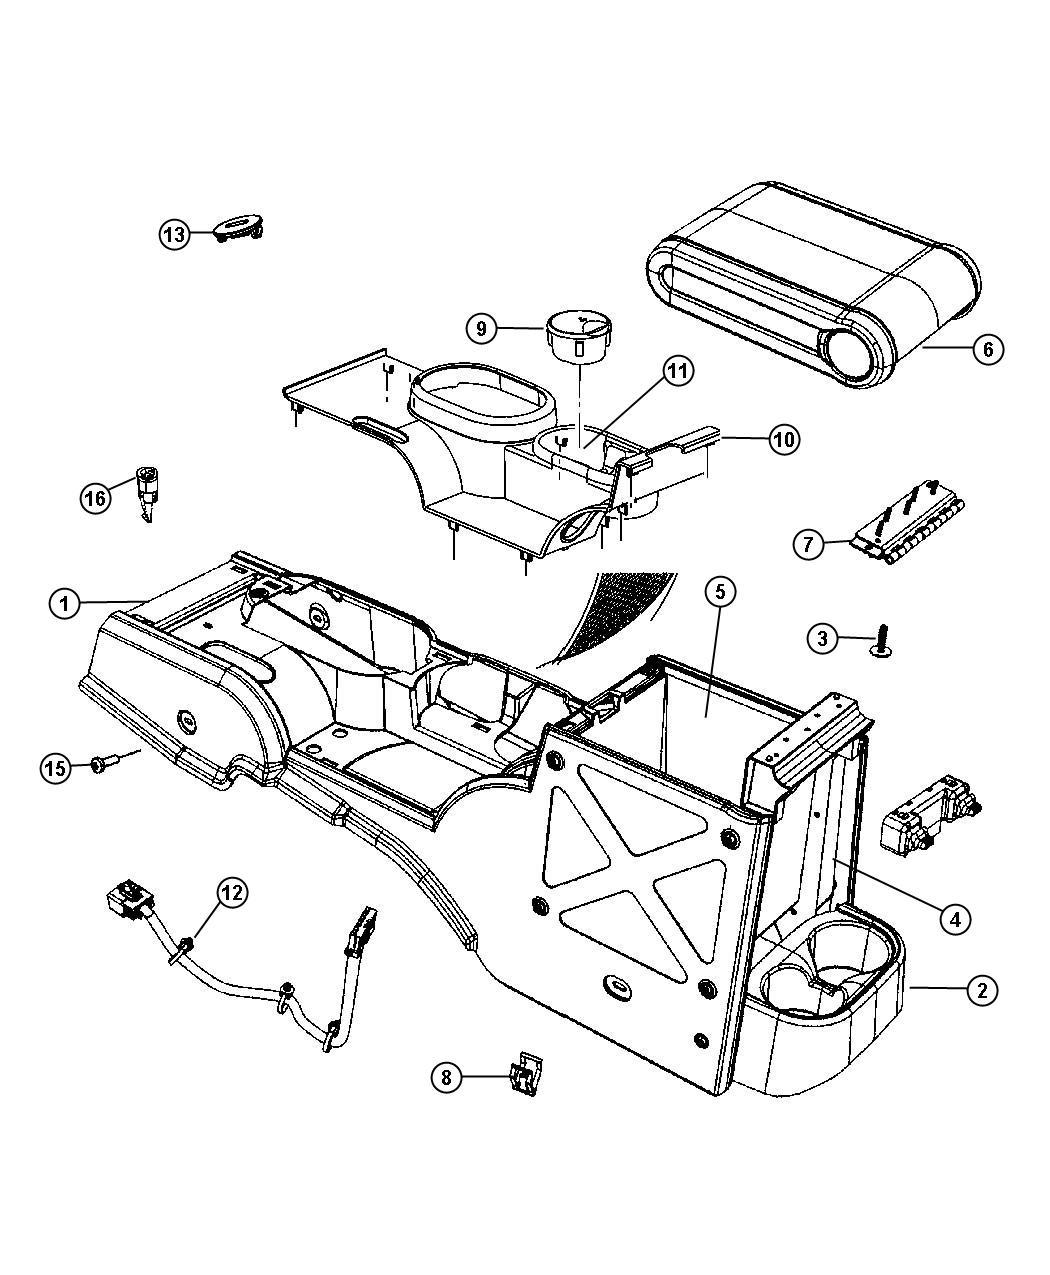 2010 Jeep Wrangler Armrest, lid. Center console storage